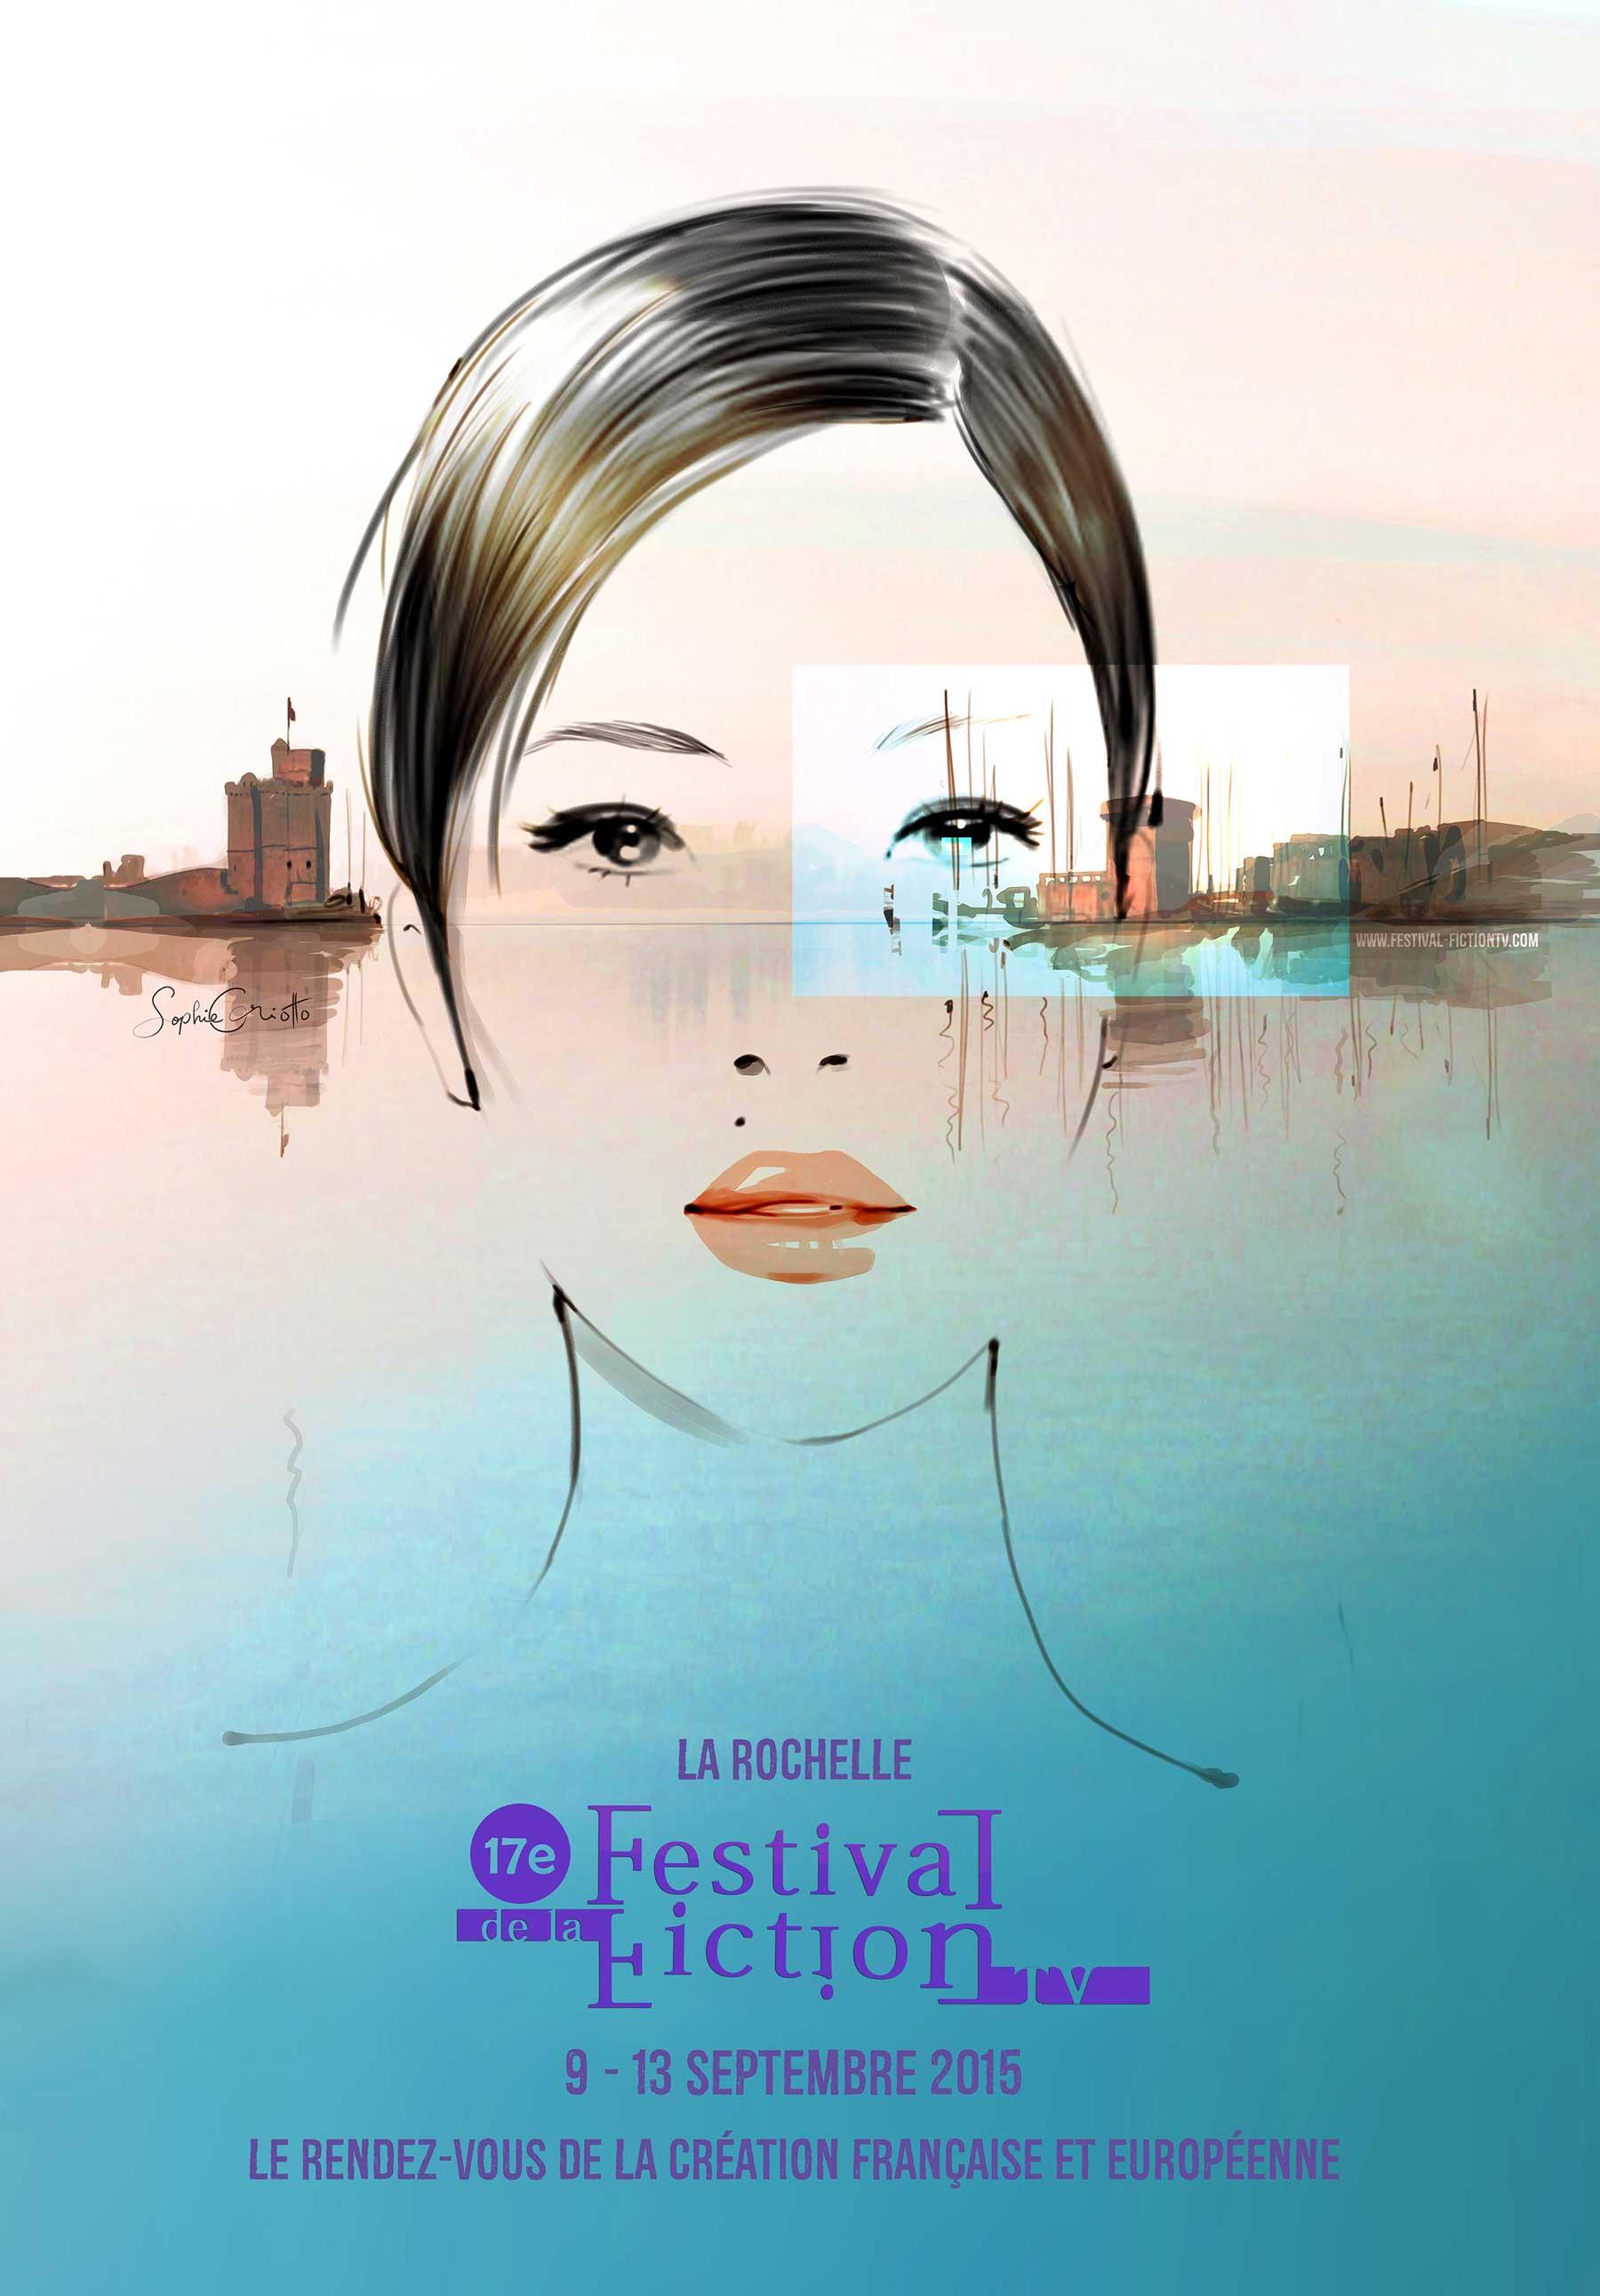 Festival de la Fiction TV de La Rochelle : petit aperçu de la programmation